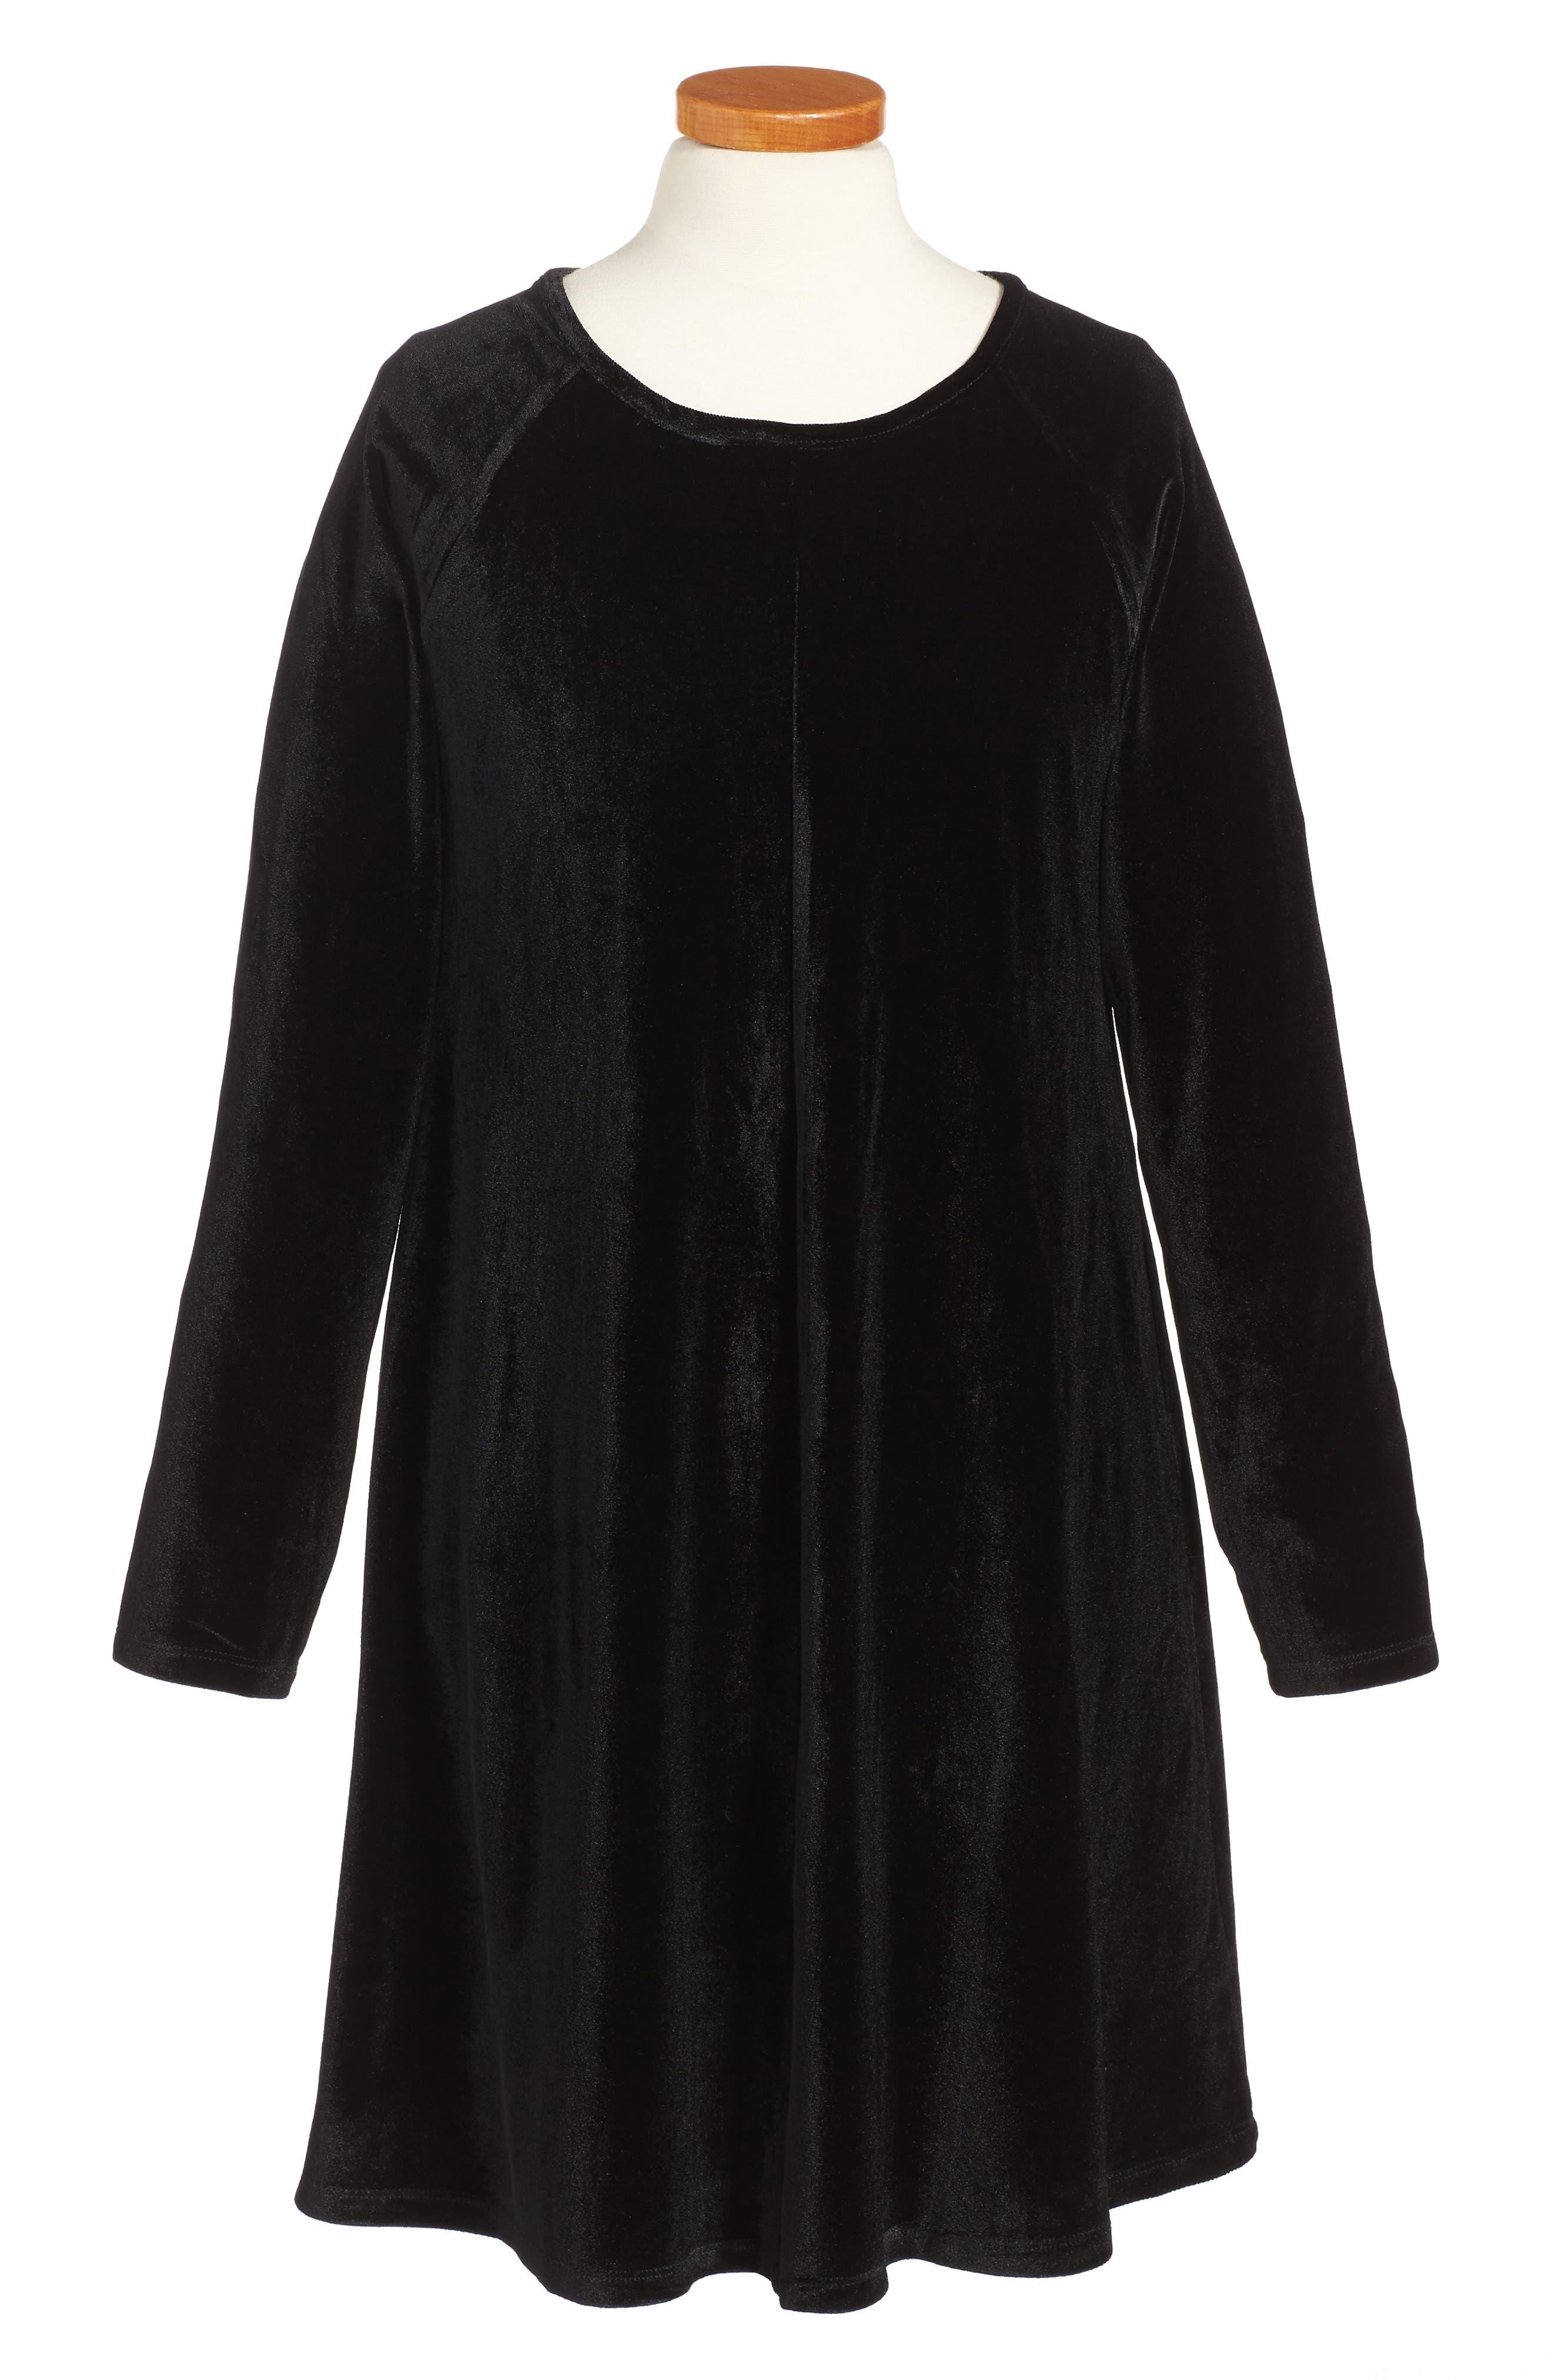 Alternate Image 1 Selected - Miss Behave Barbara Dress (Big Girls)